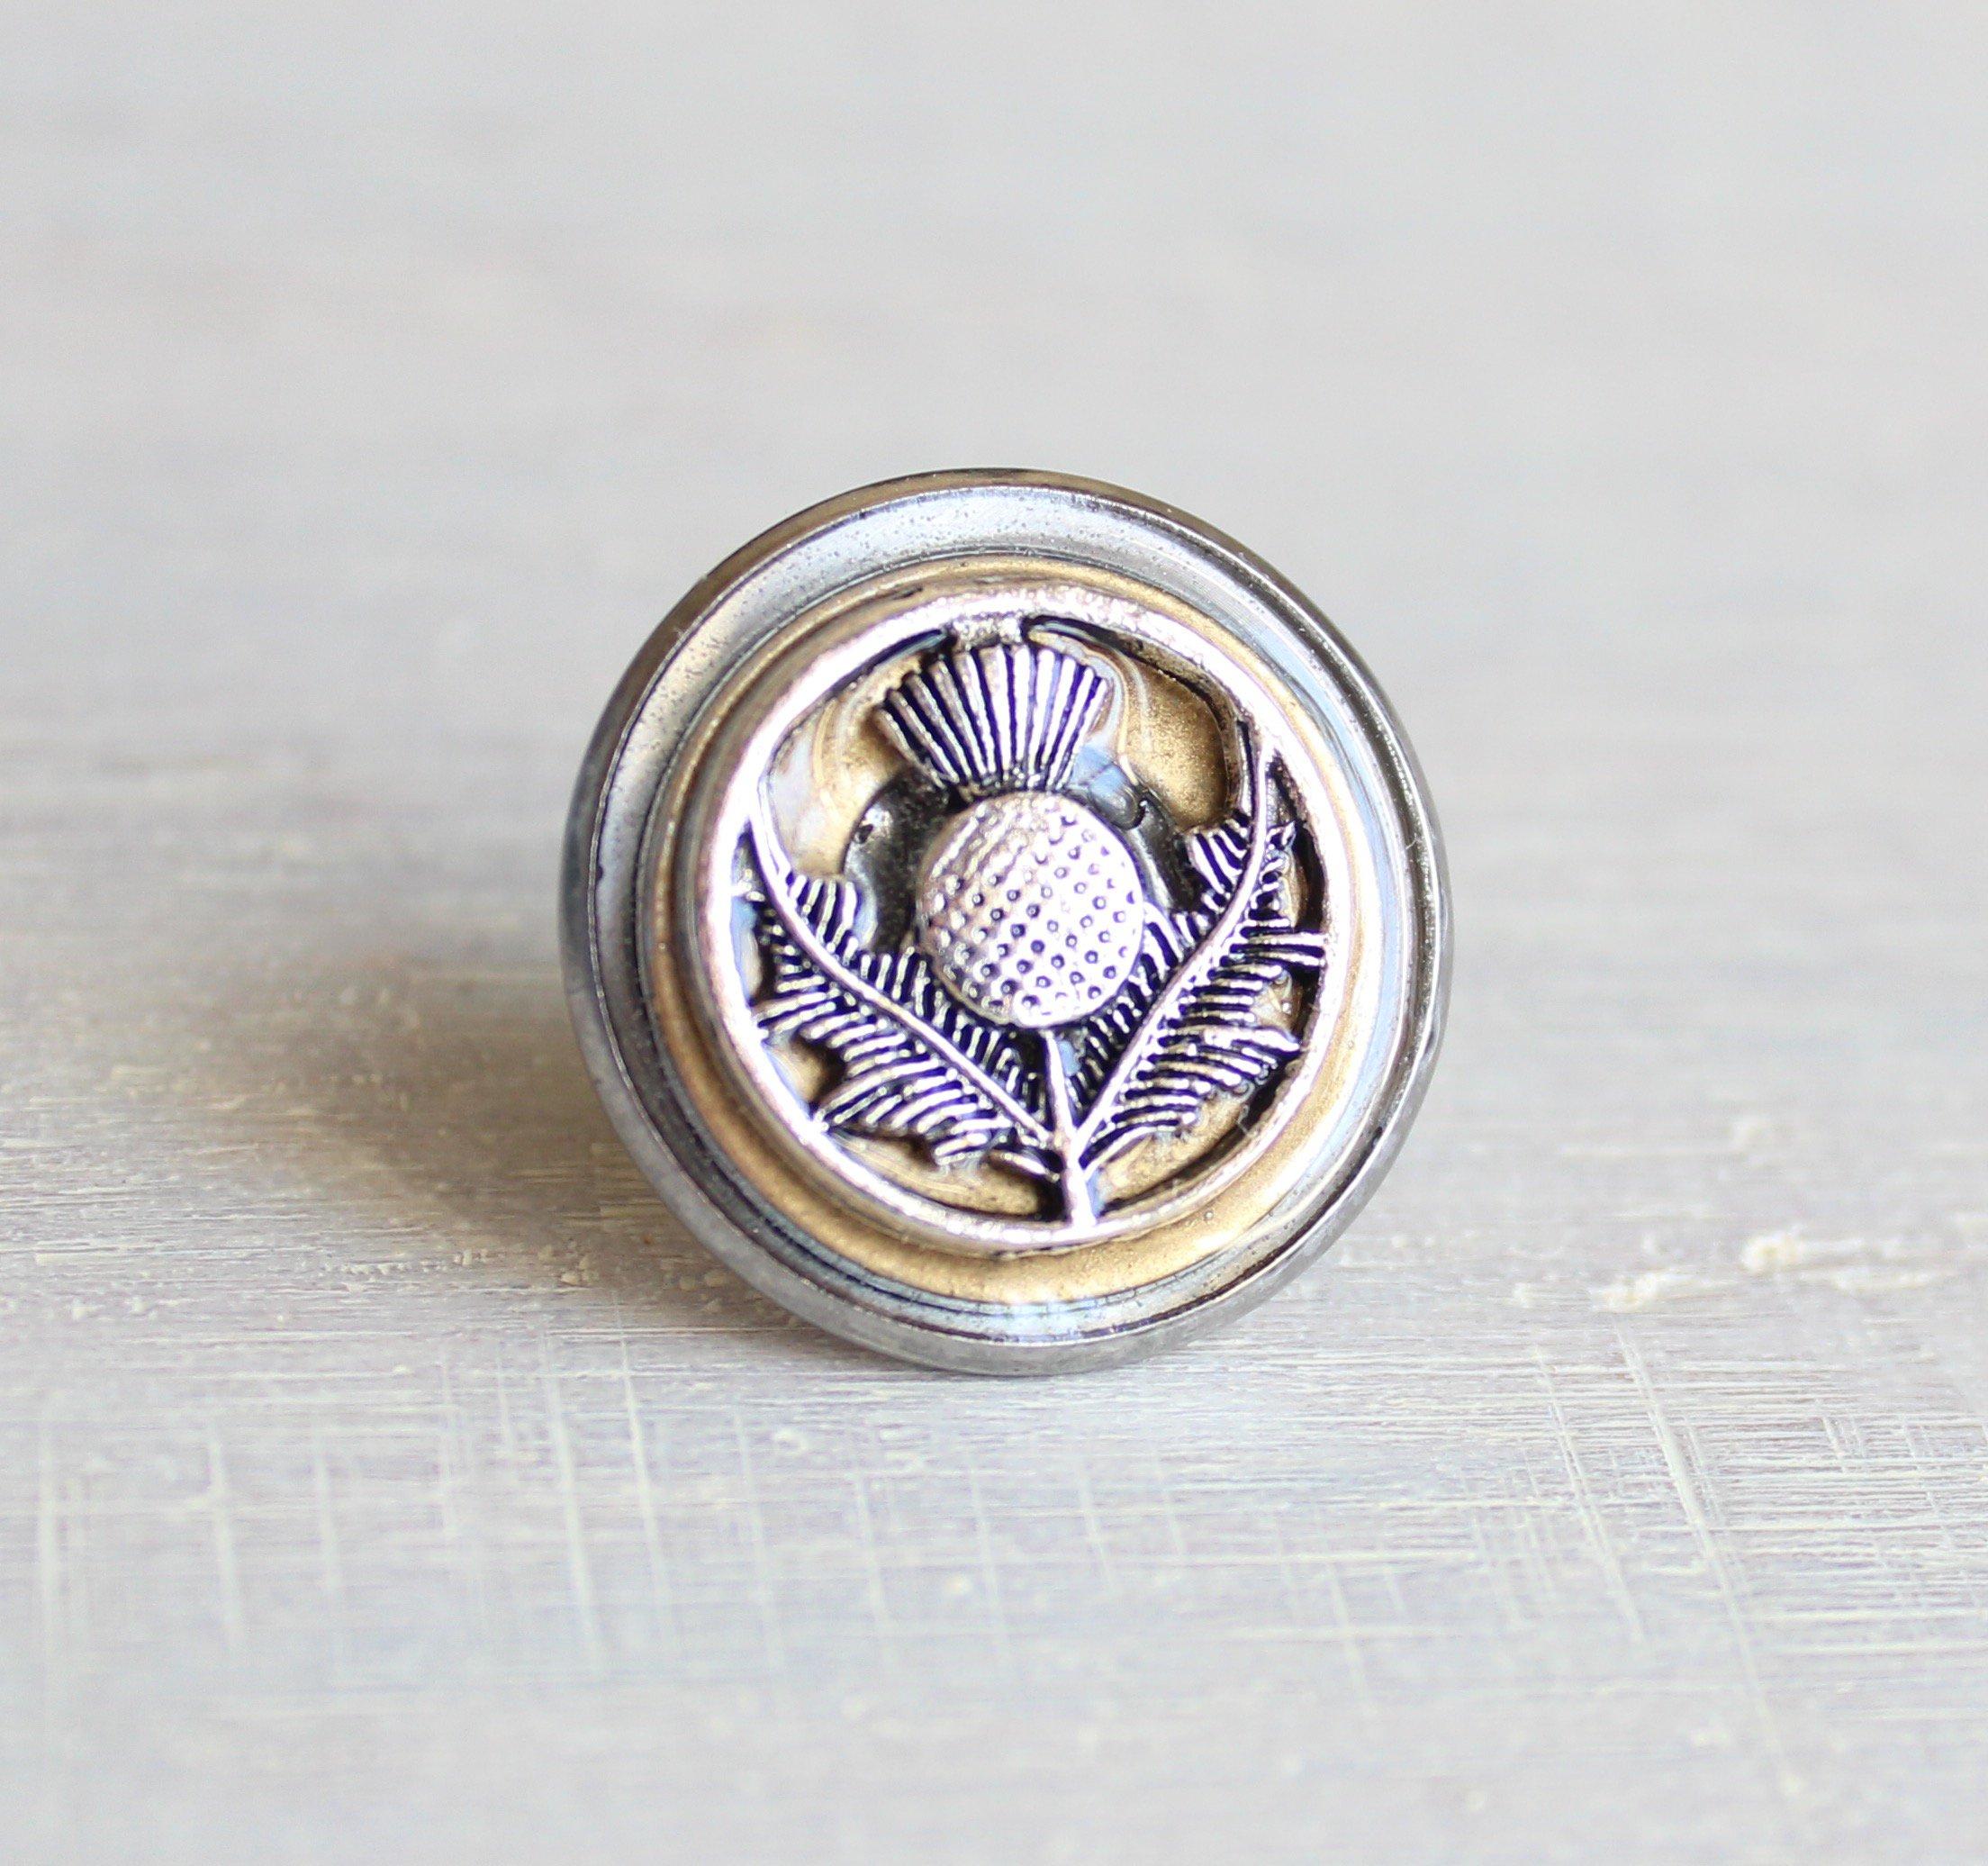 Golden Scottish thistle tie tack / lapel pin.